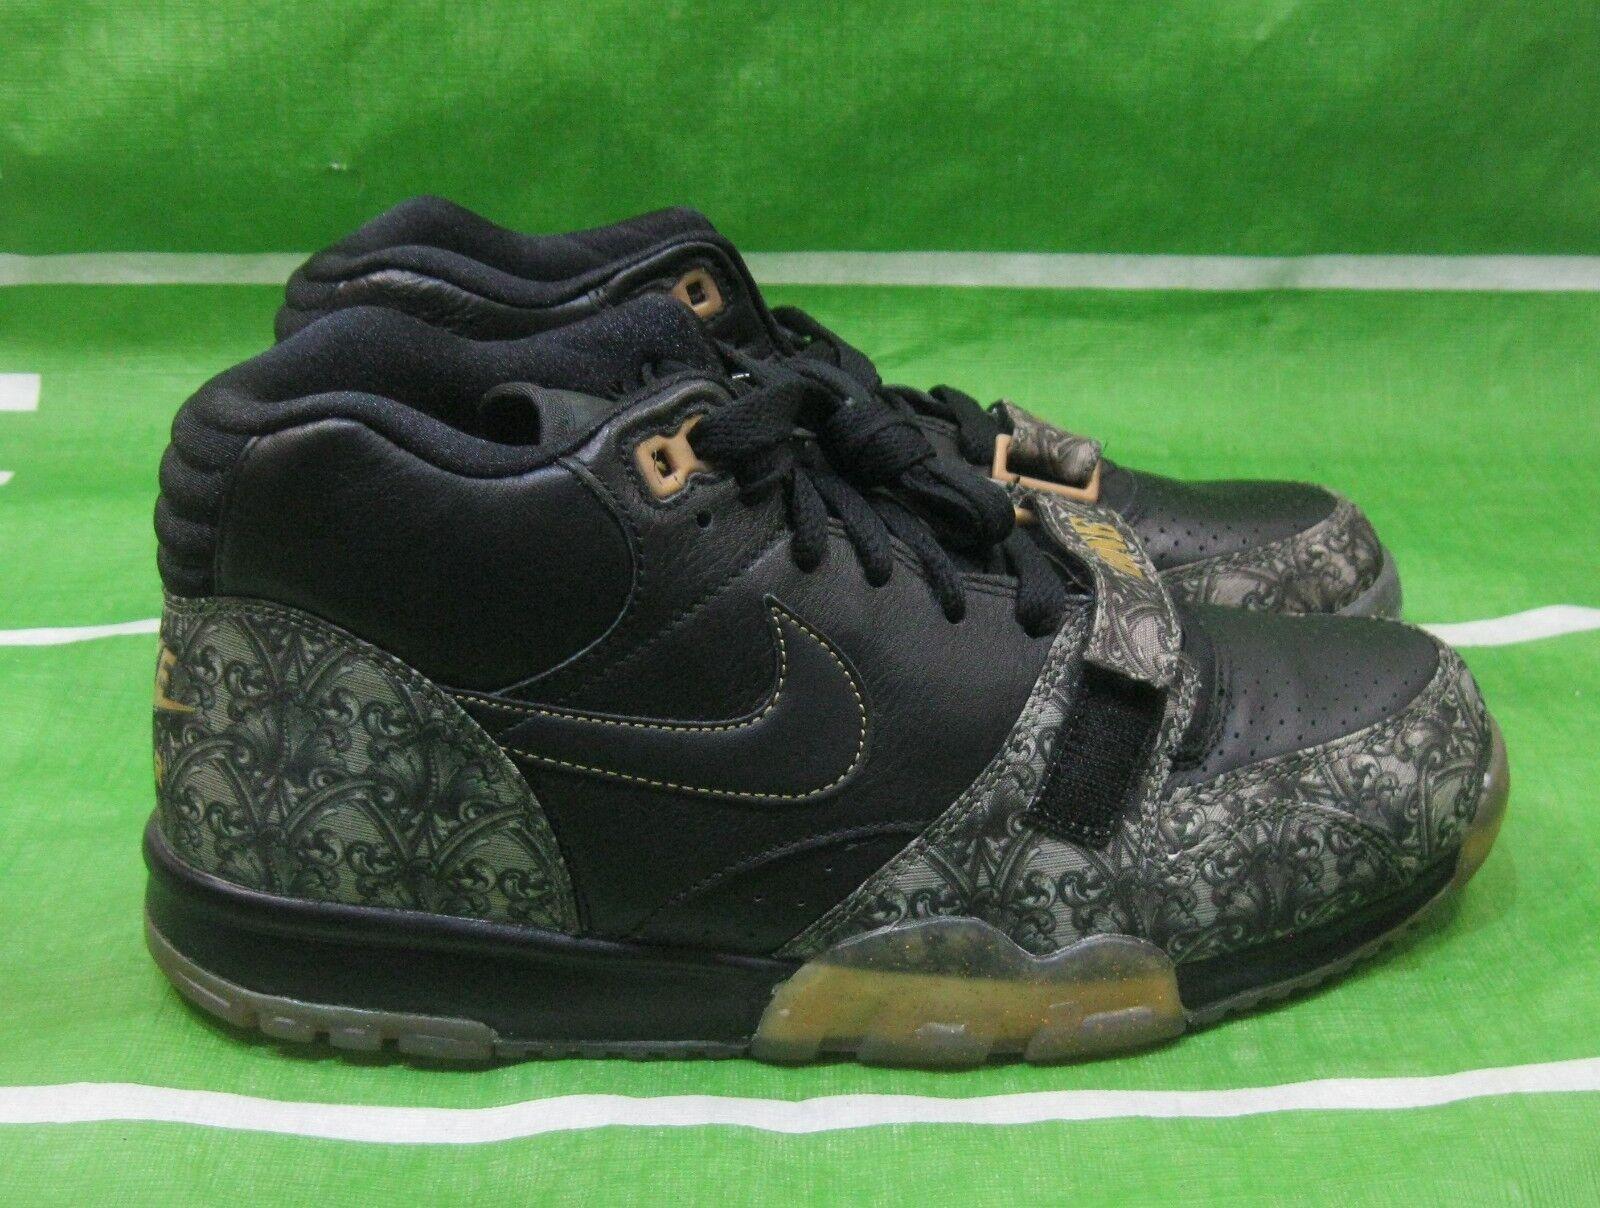 Nike Air Trainer 1 MID PRM QS 607081-002 Black Metallic Gold Money One Size 10